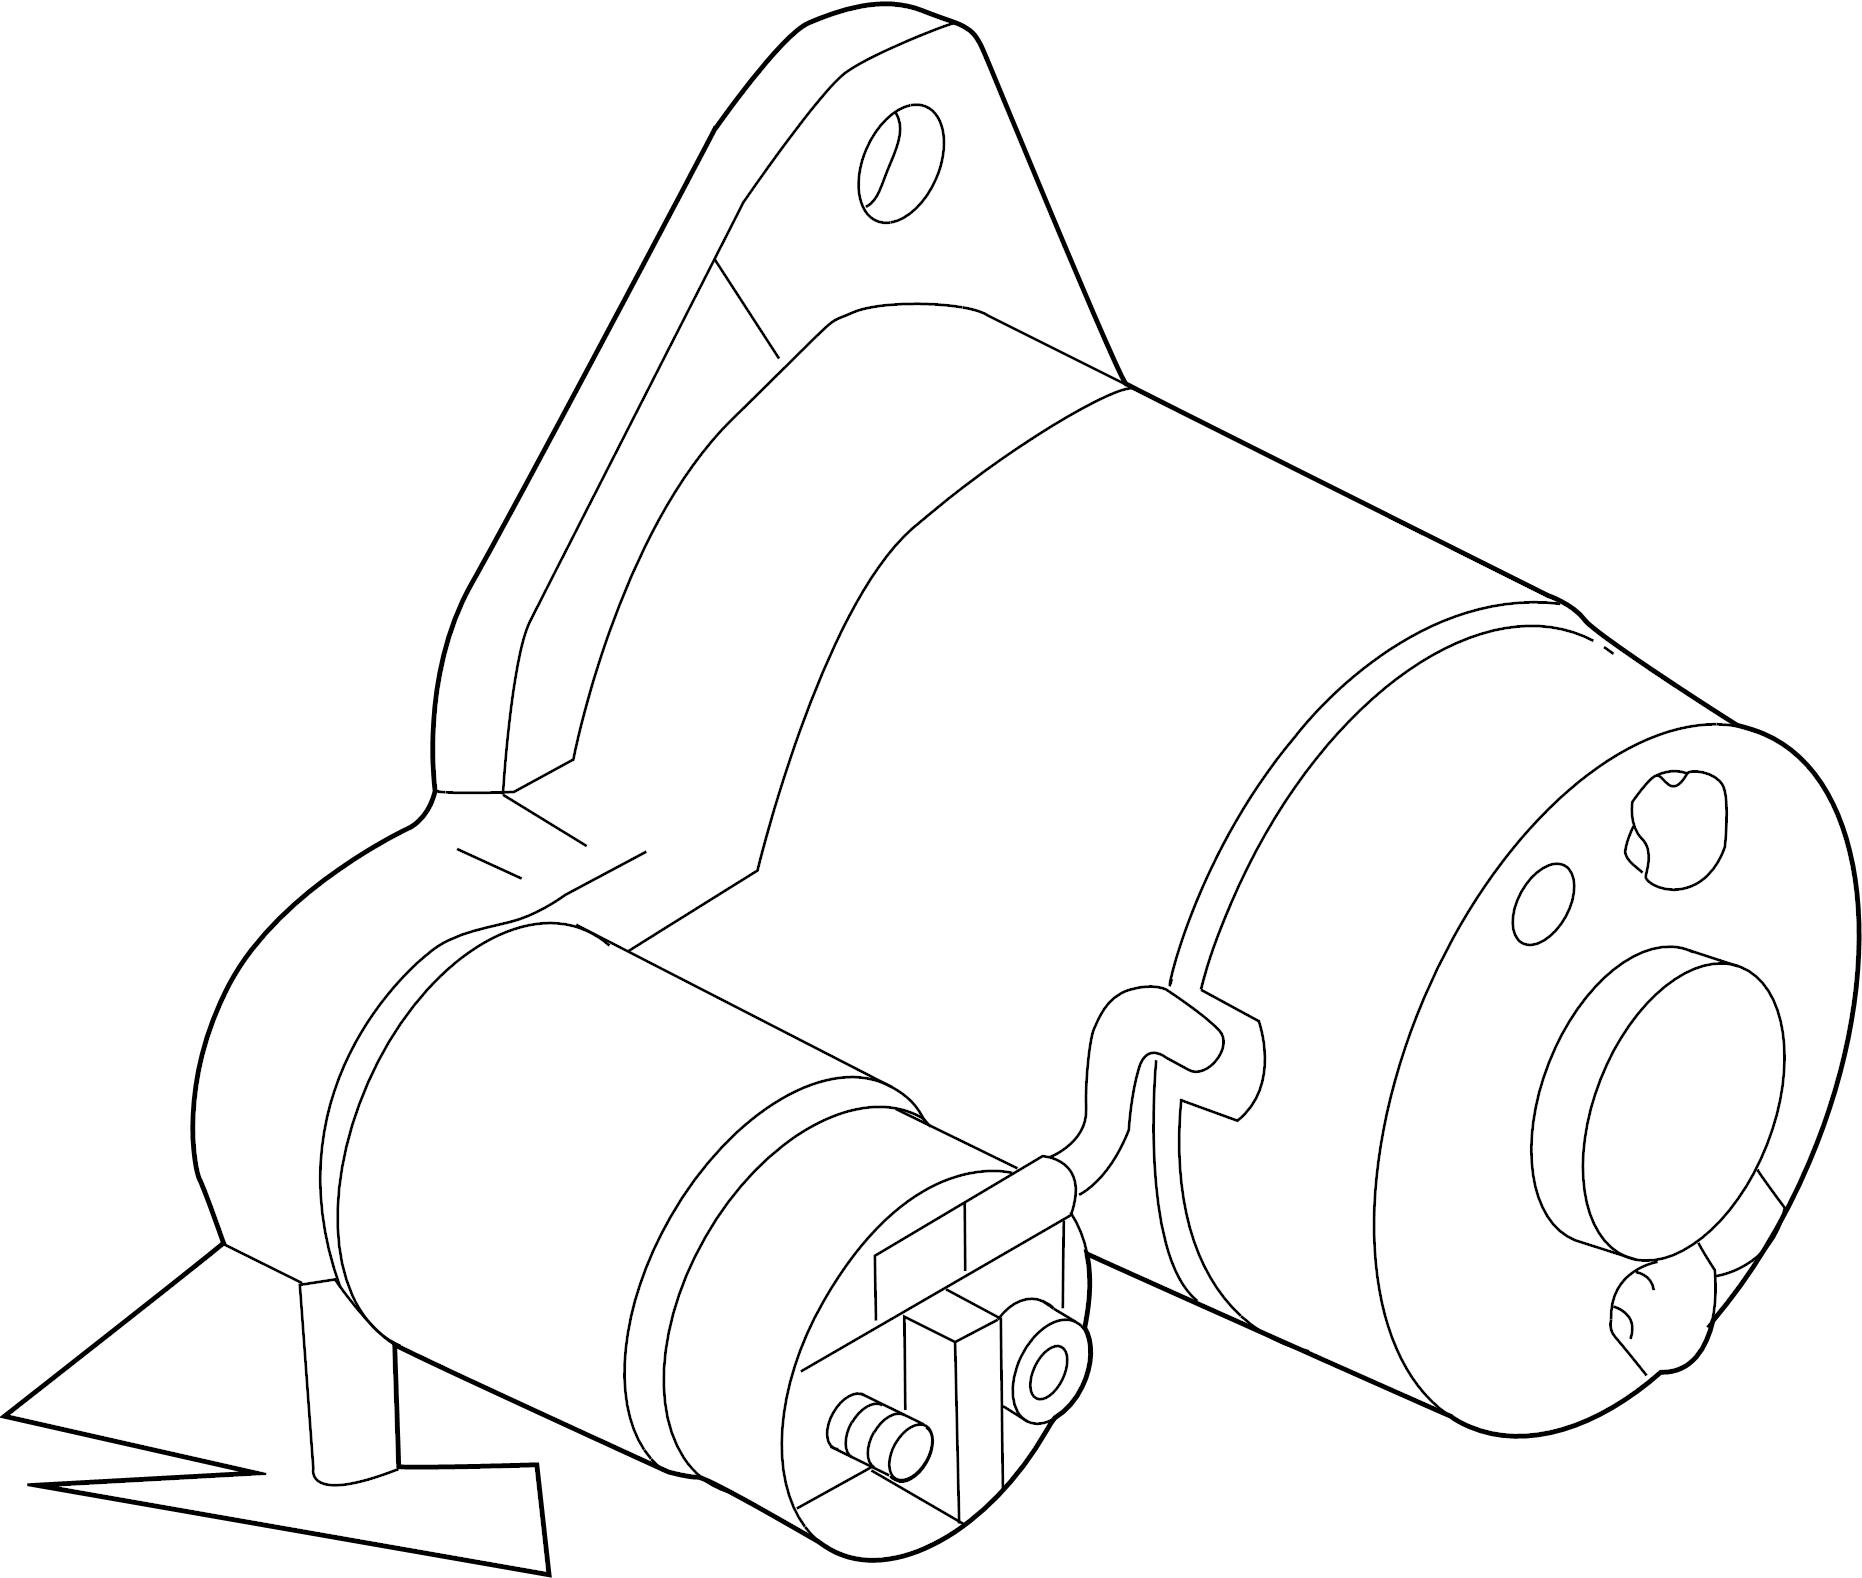 Nissan Altima Starter Motor. Liter, Trans, Manual